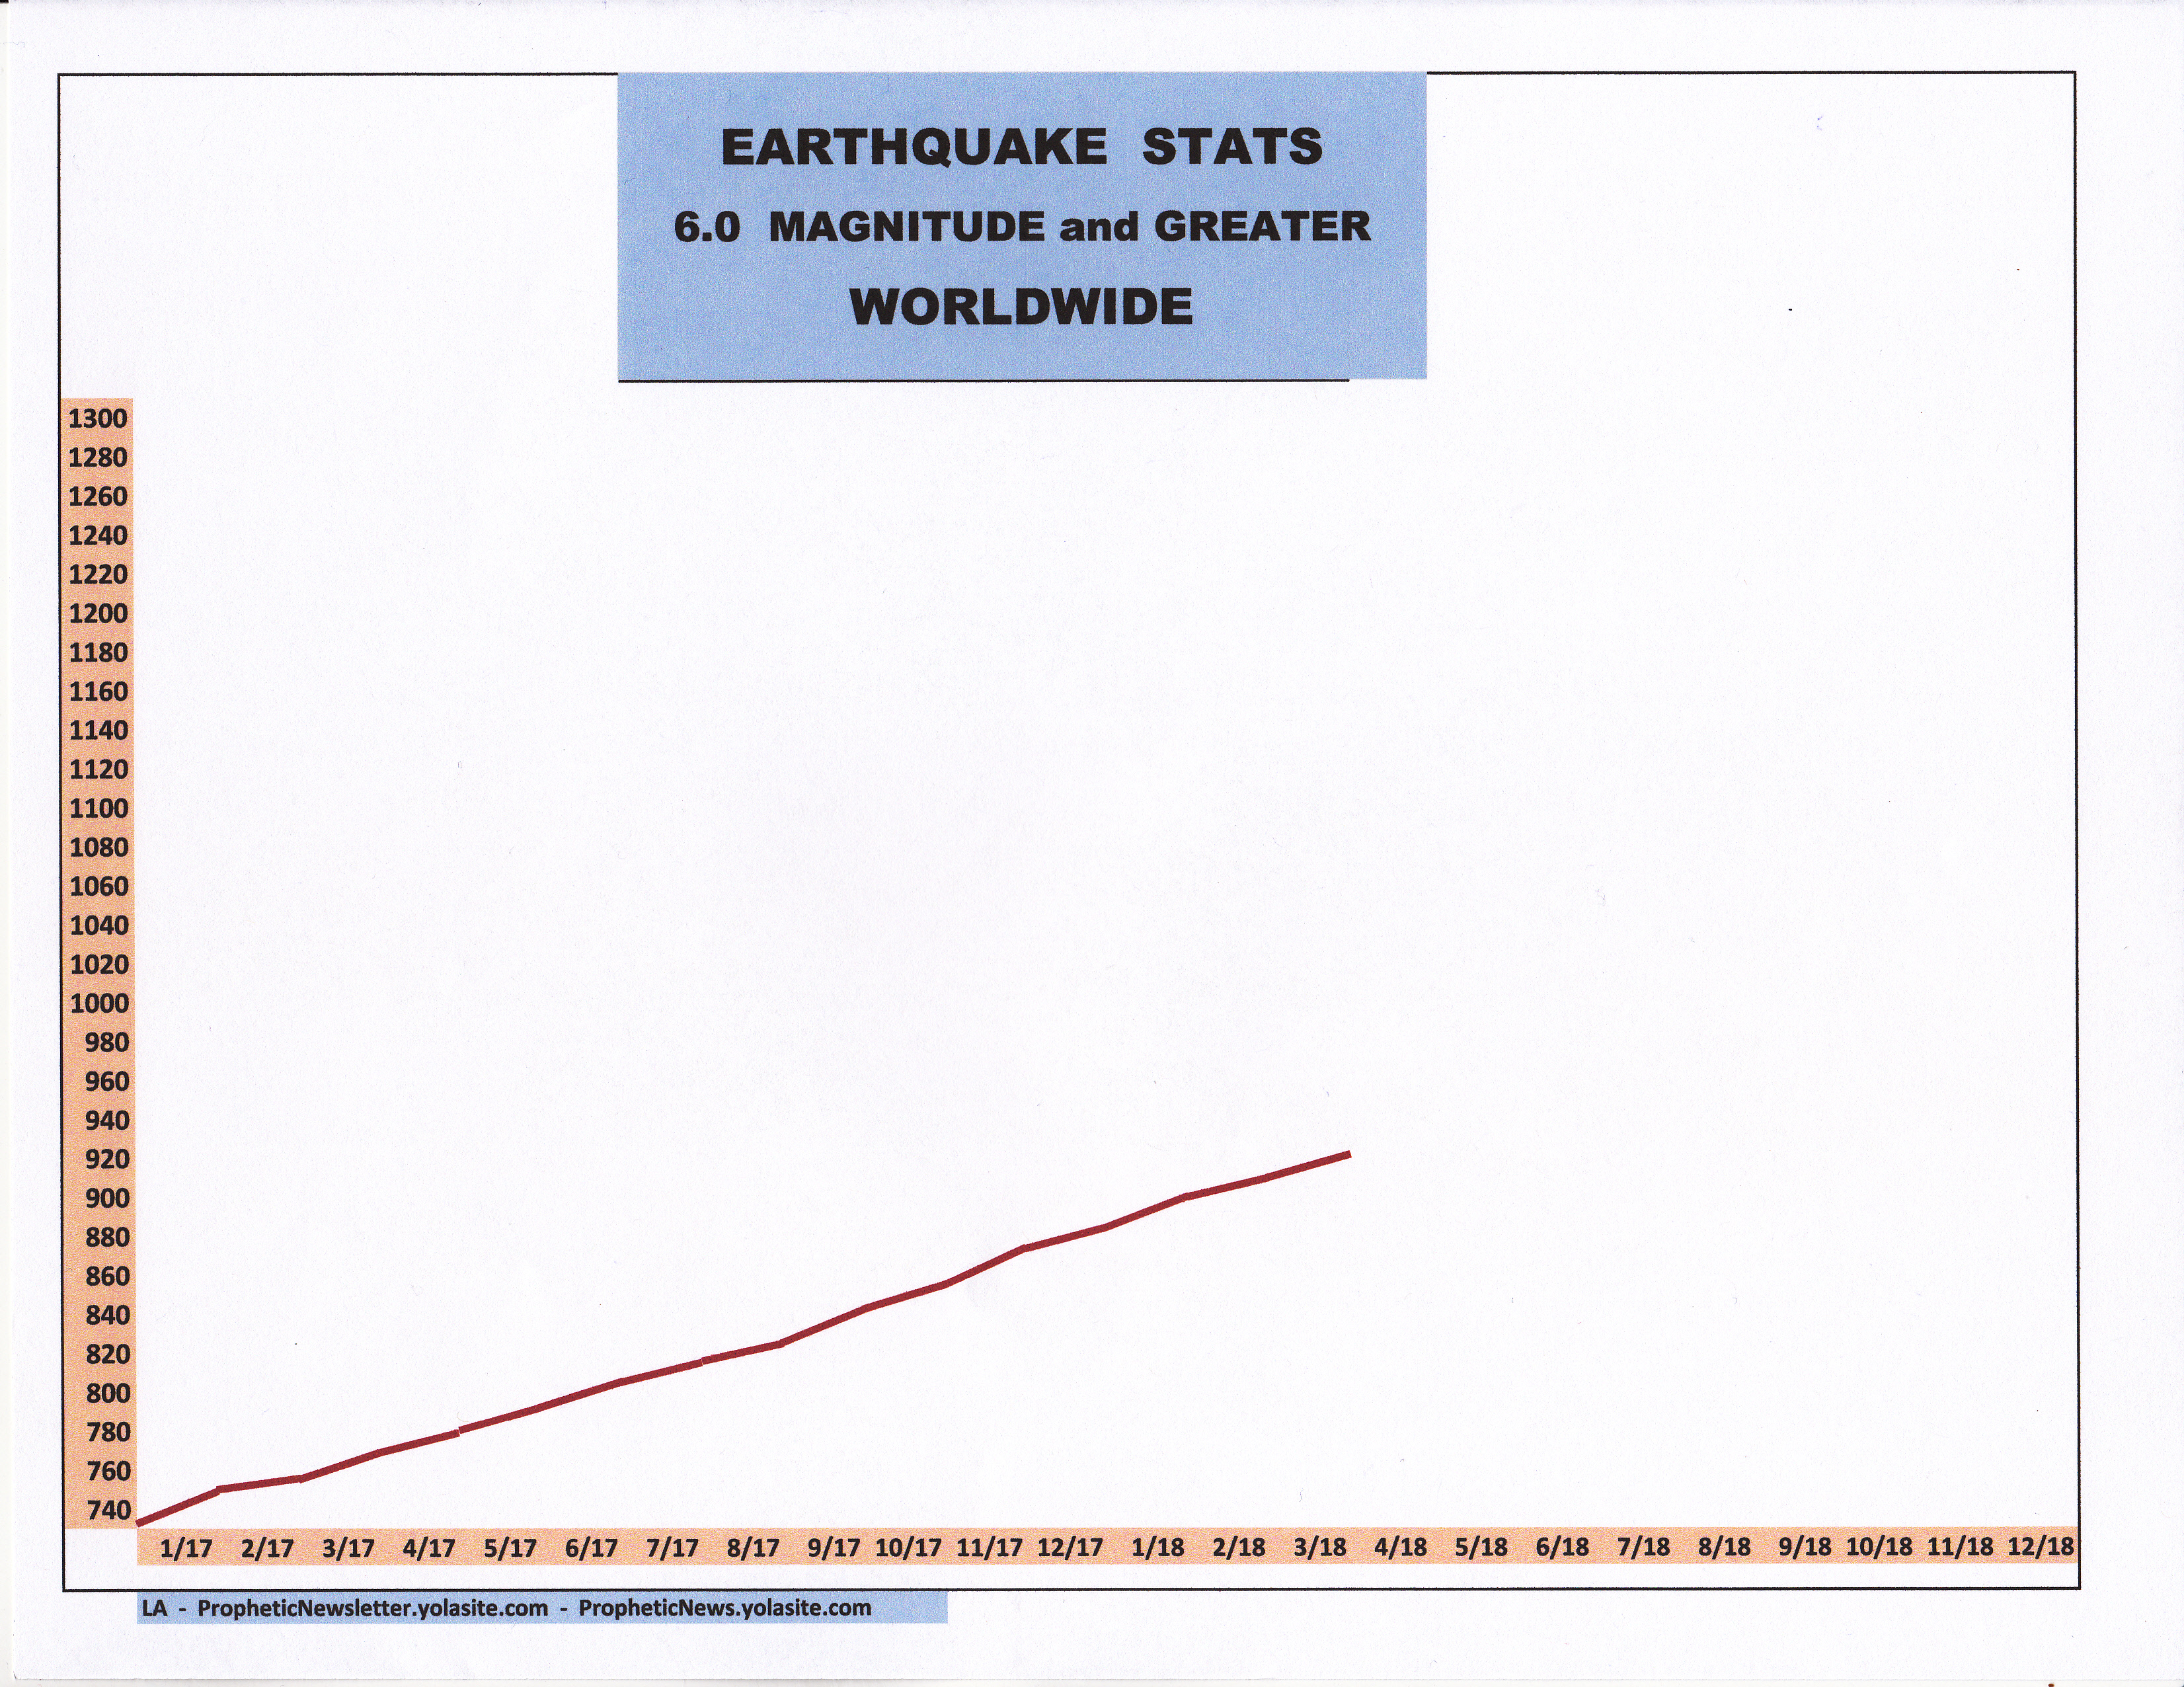 4-18 EARTHQUAKE STATS